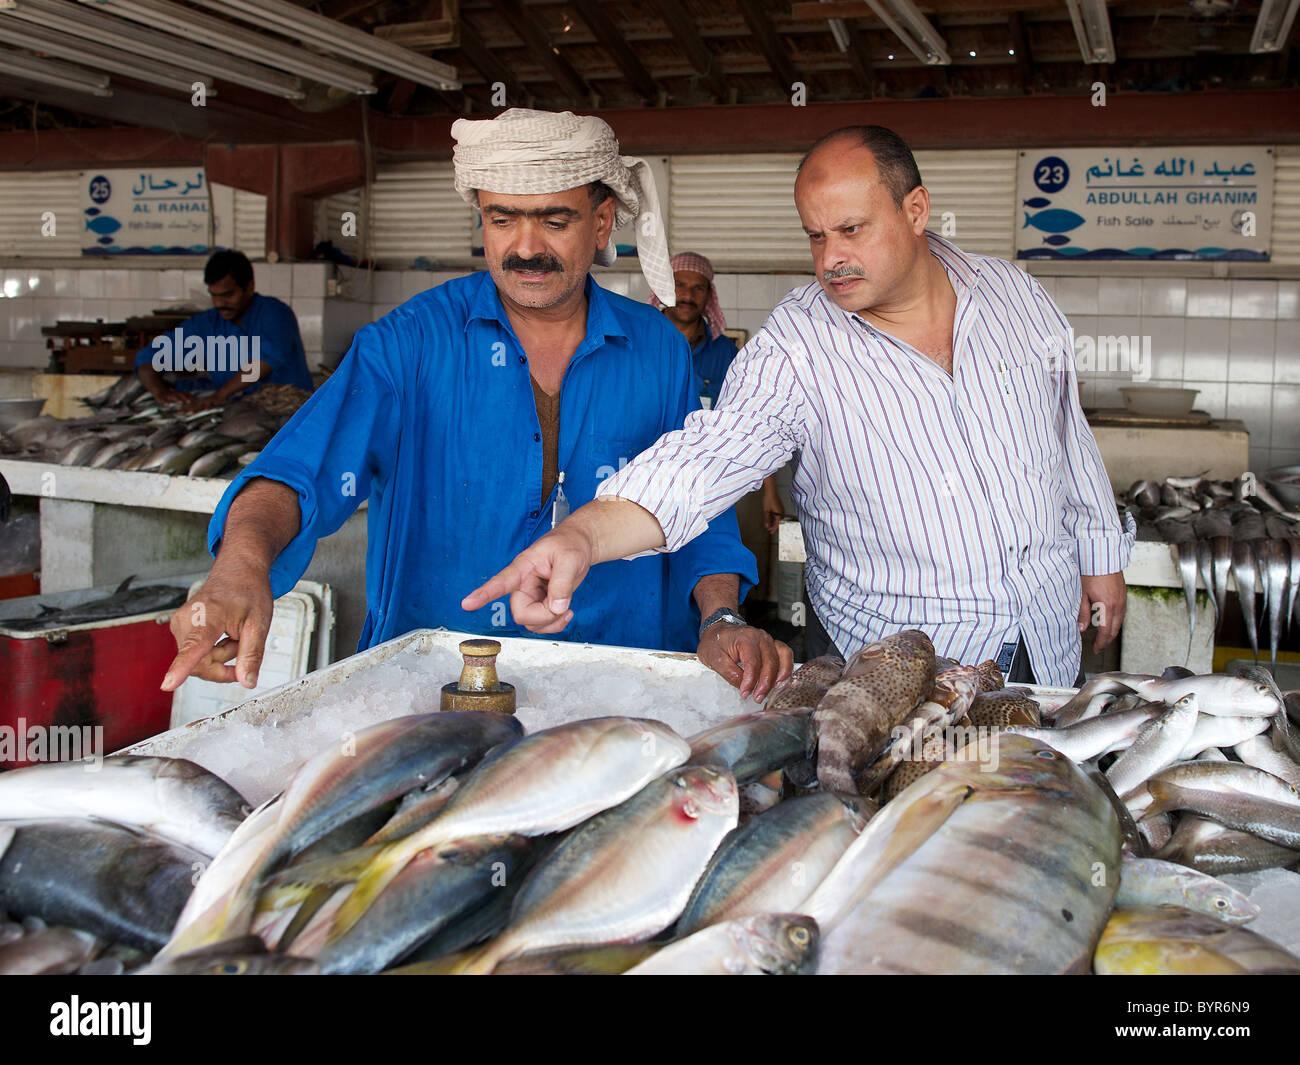 Choosing fresh fish at Sharjah fish market, Dubai, UAE Stock